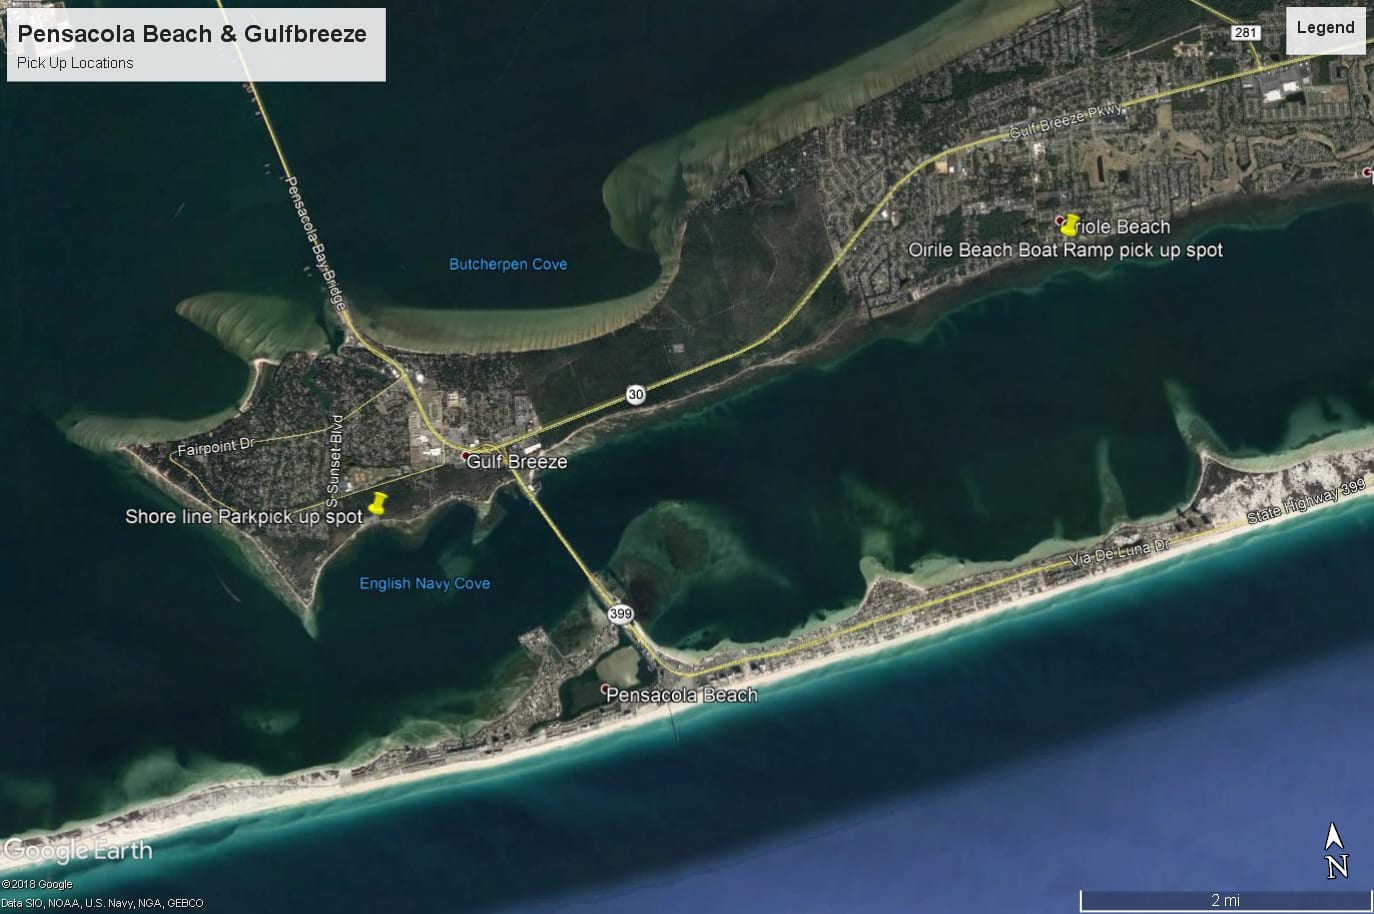 pensacola beach & Gulfbreeze pick up Locations